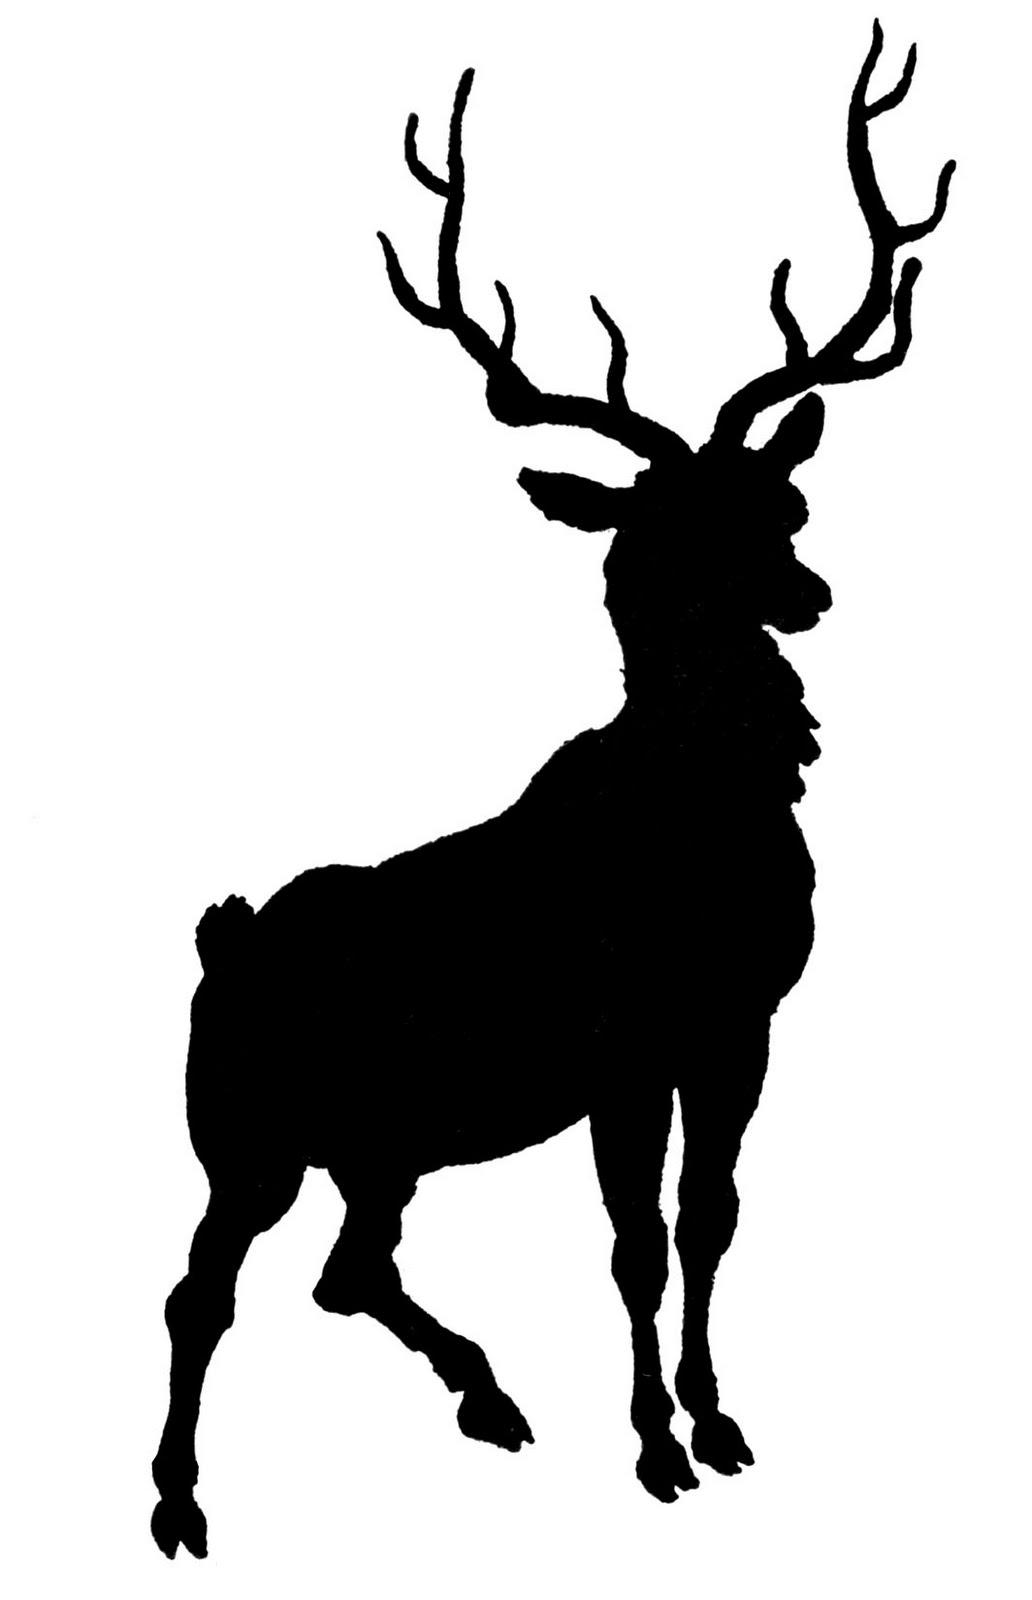 1032x1600 Deer Silhouette Clipart